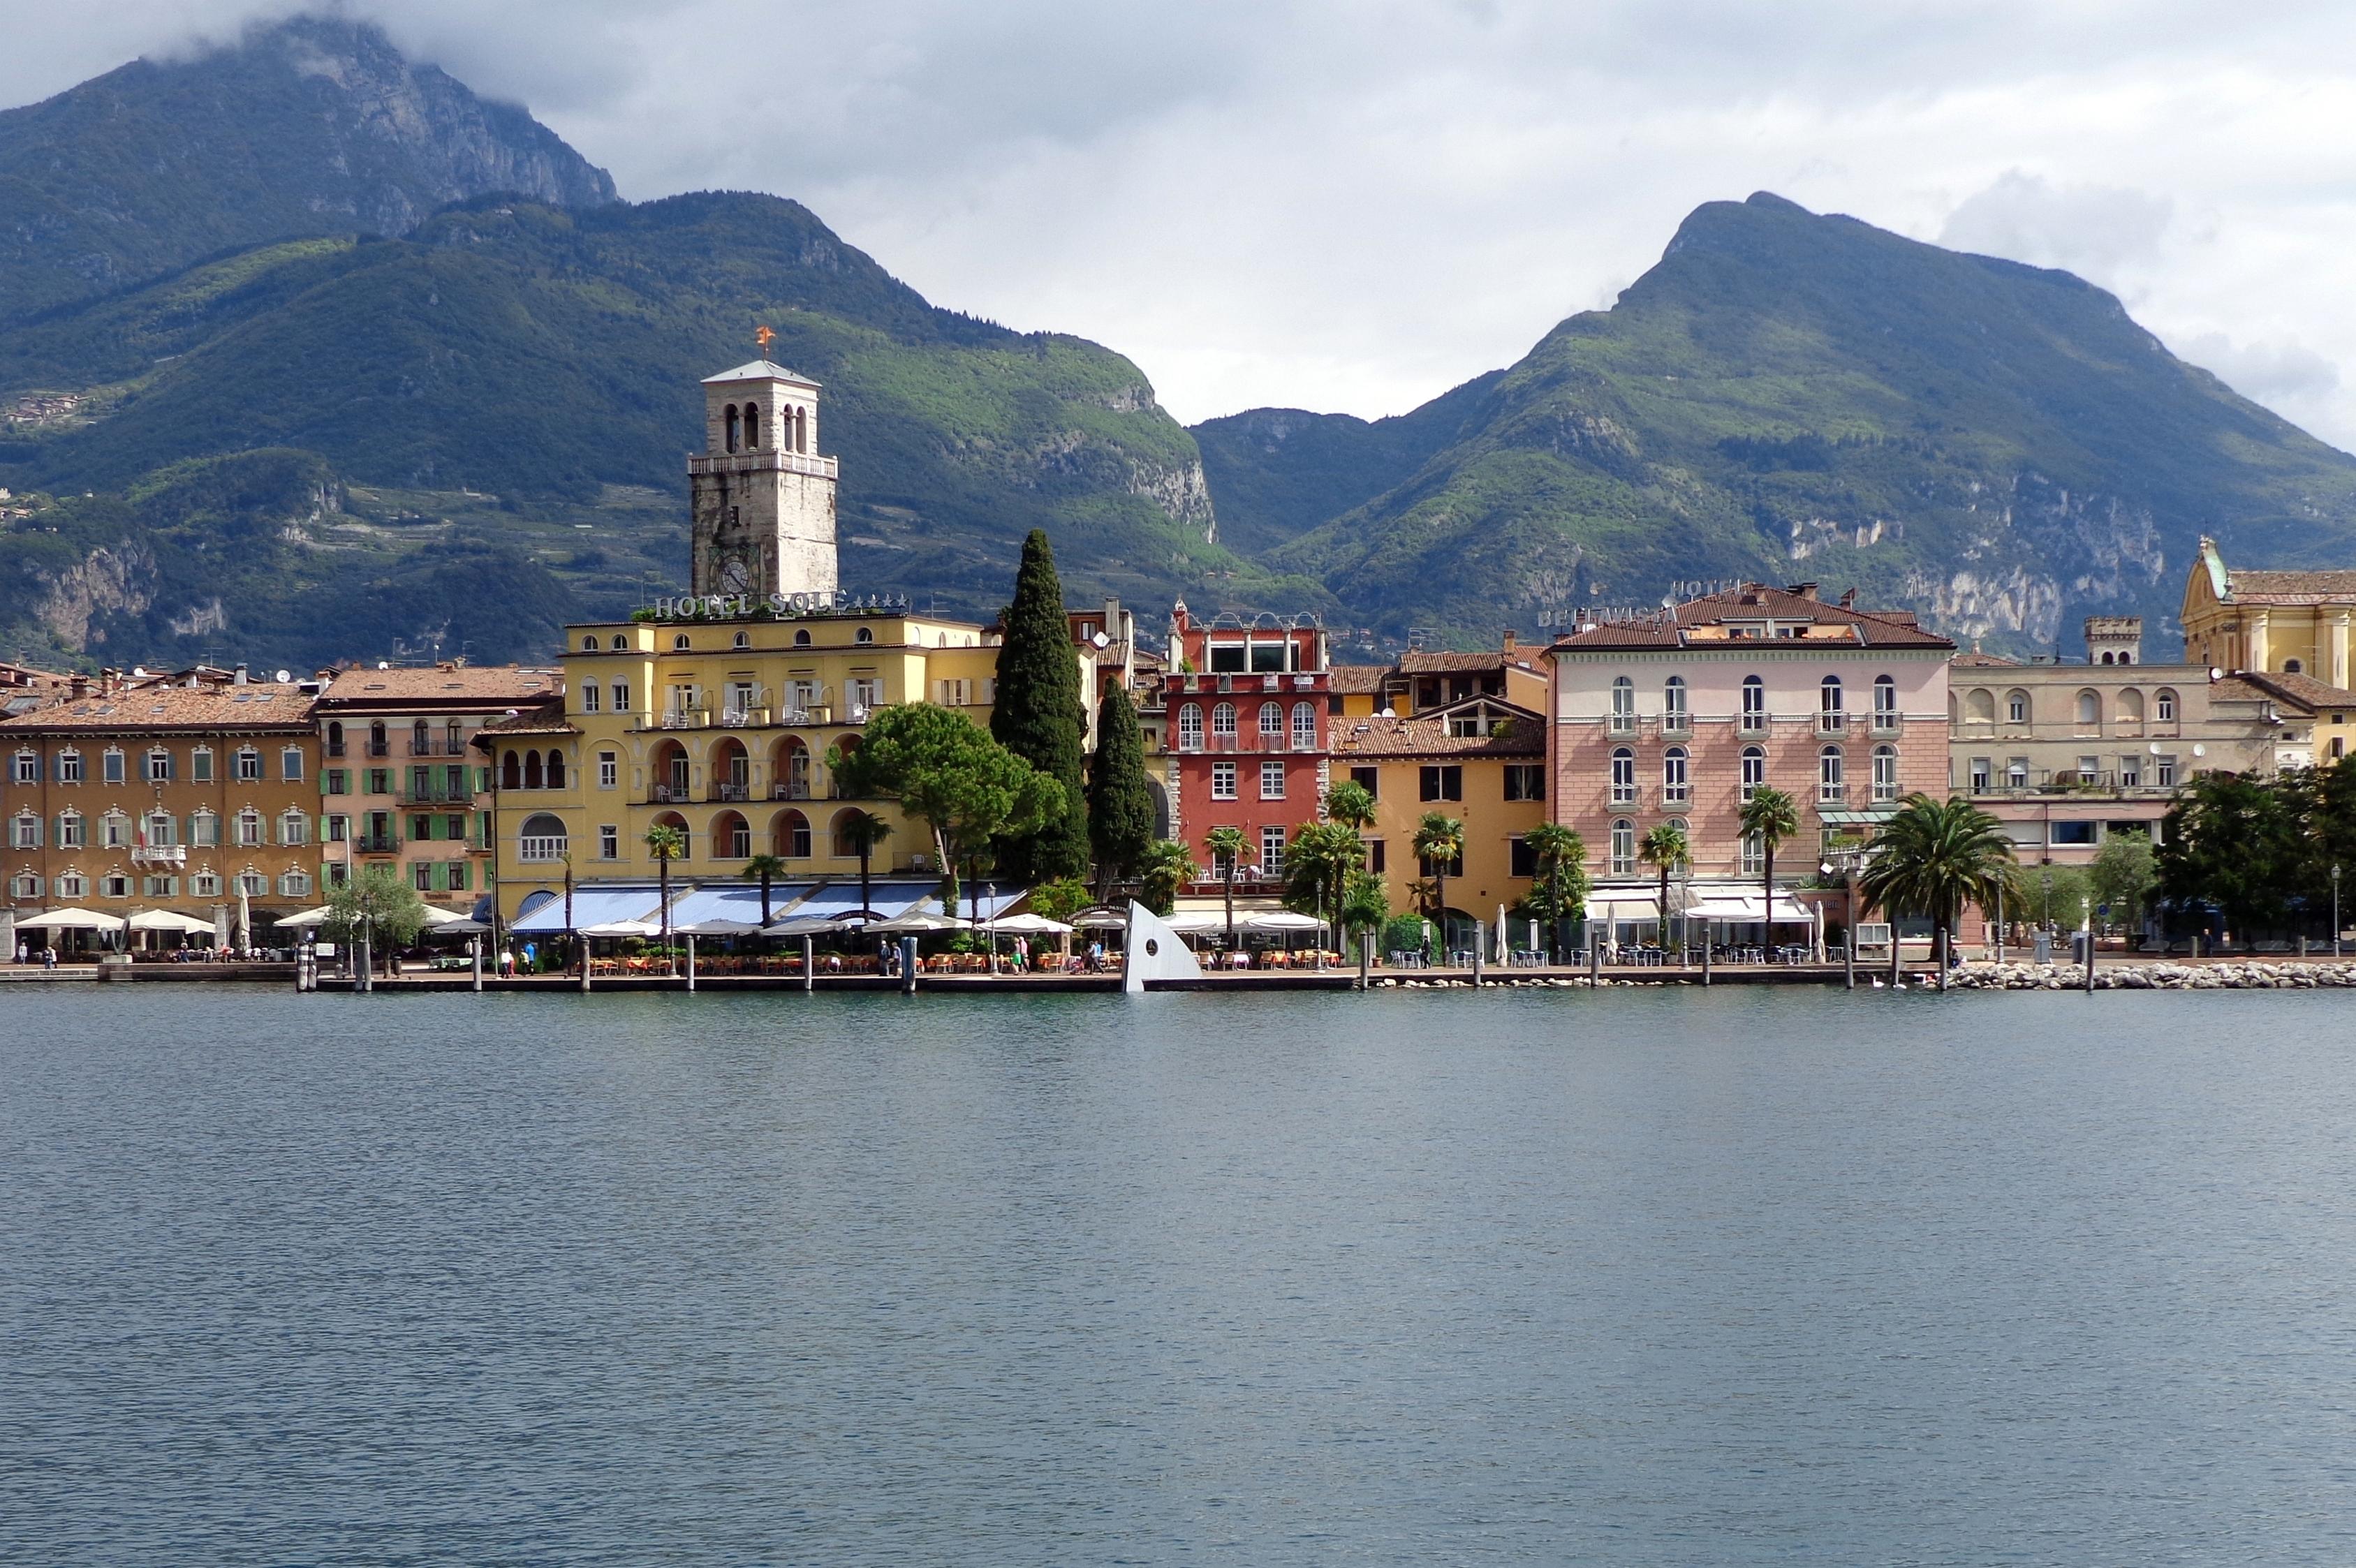 Riva Del Garda Italy  city photos : Description Riva del Garda, Italy